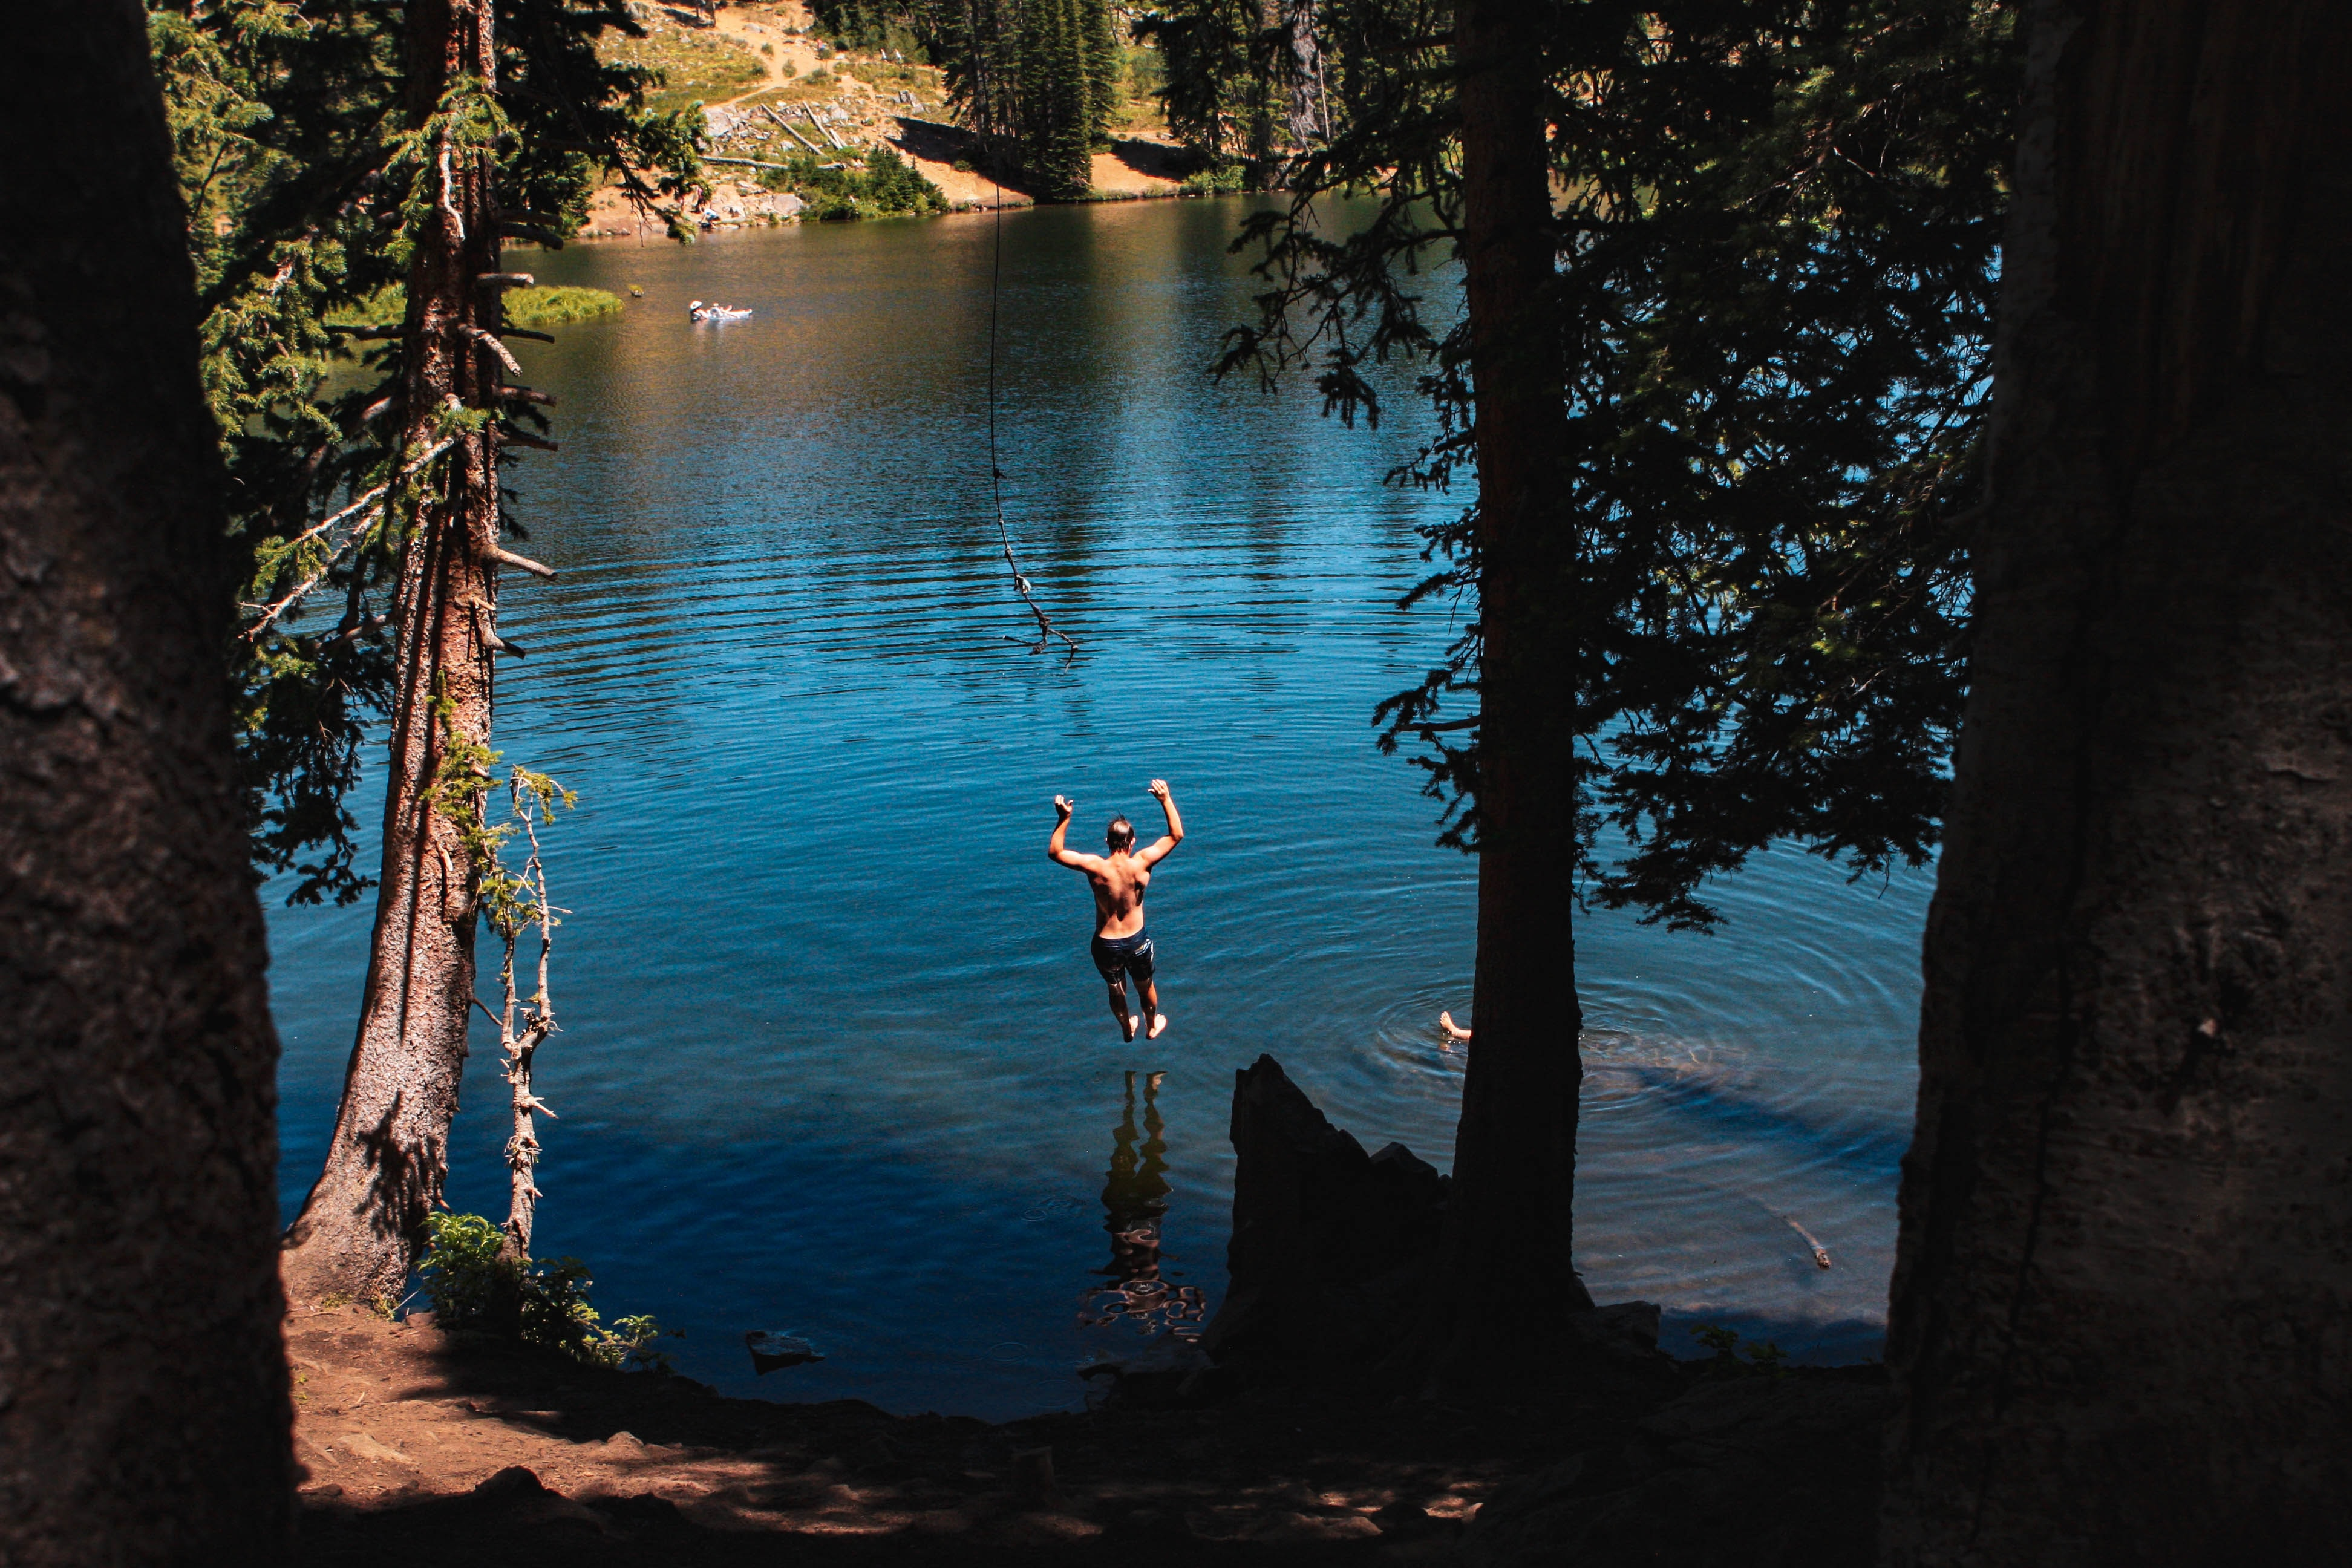 man jump into river at daytime